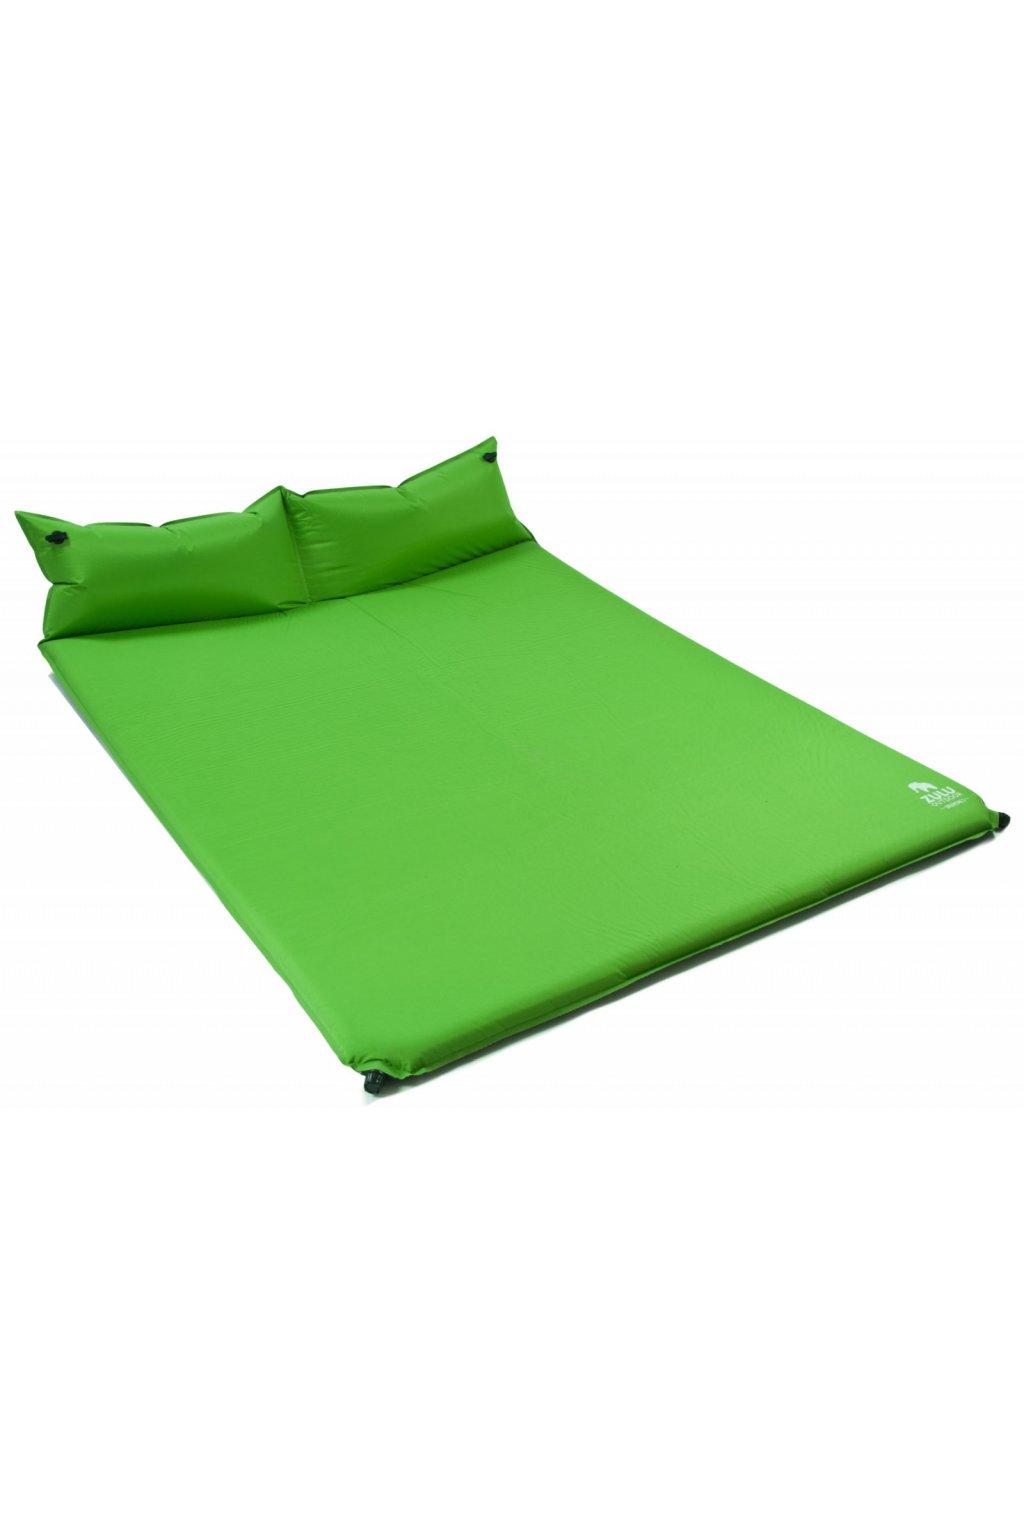 85131396 samonafukovaci karimatka zulu dreamtime 5 double pillow zelena